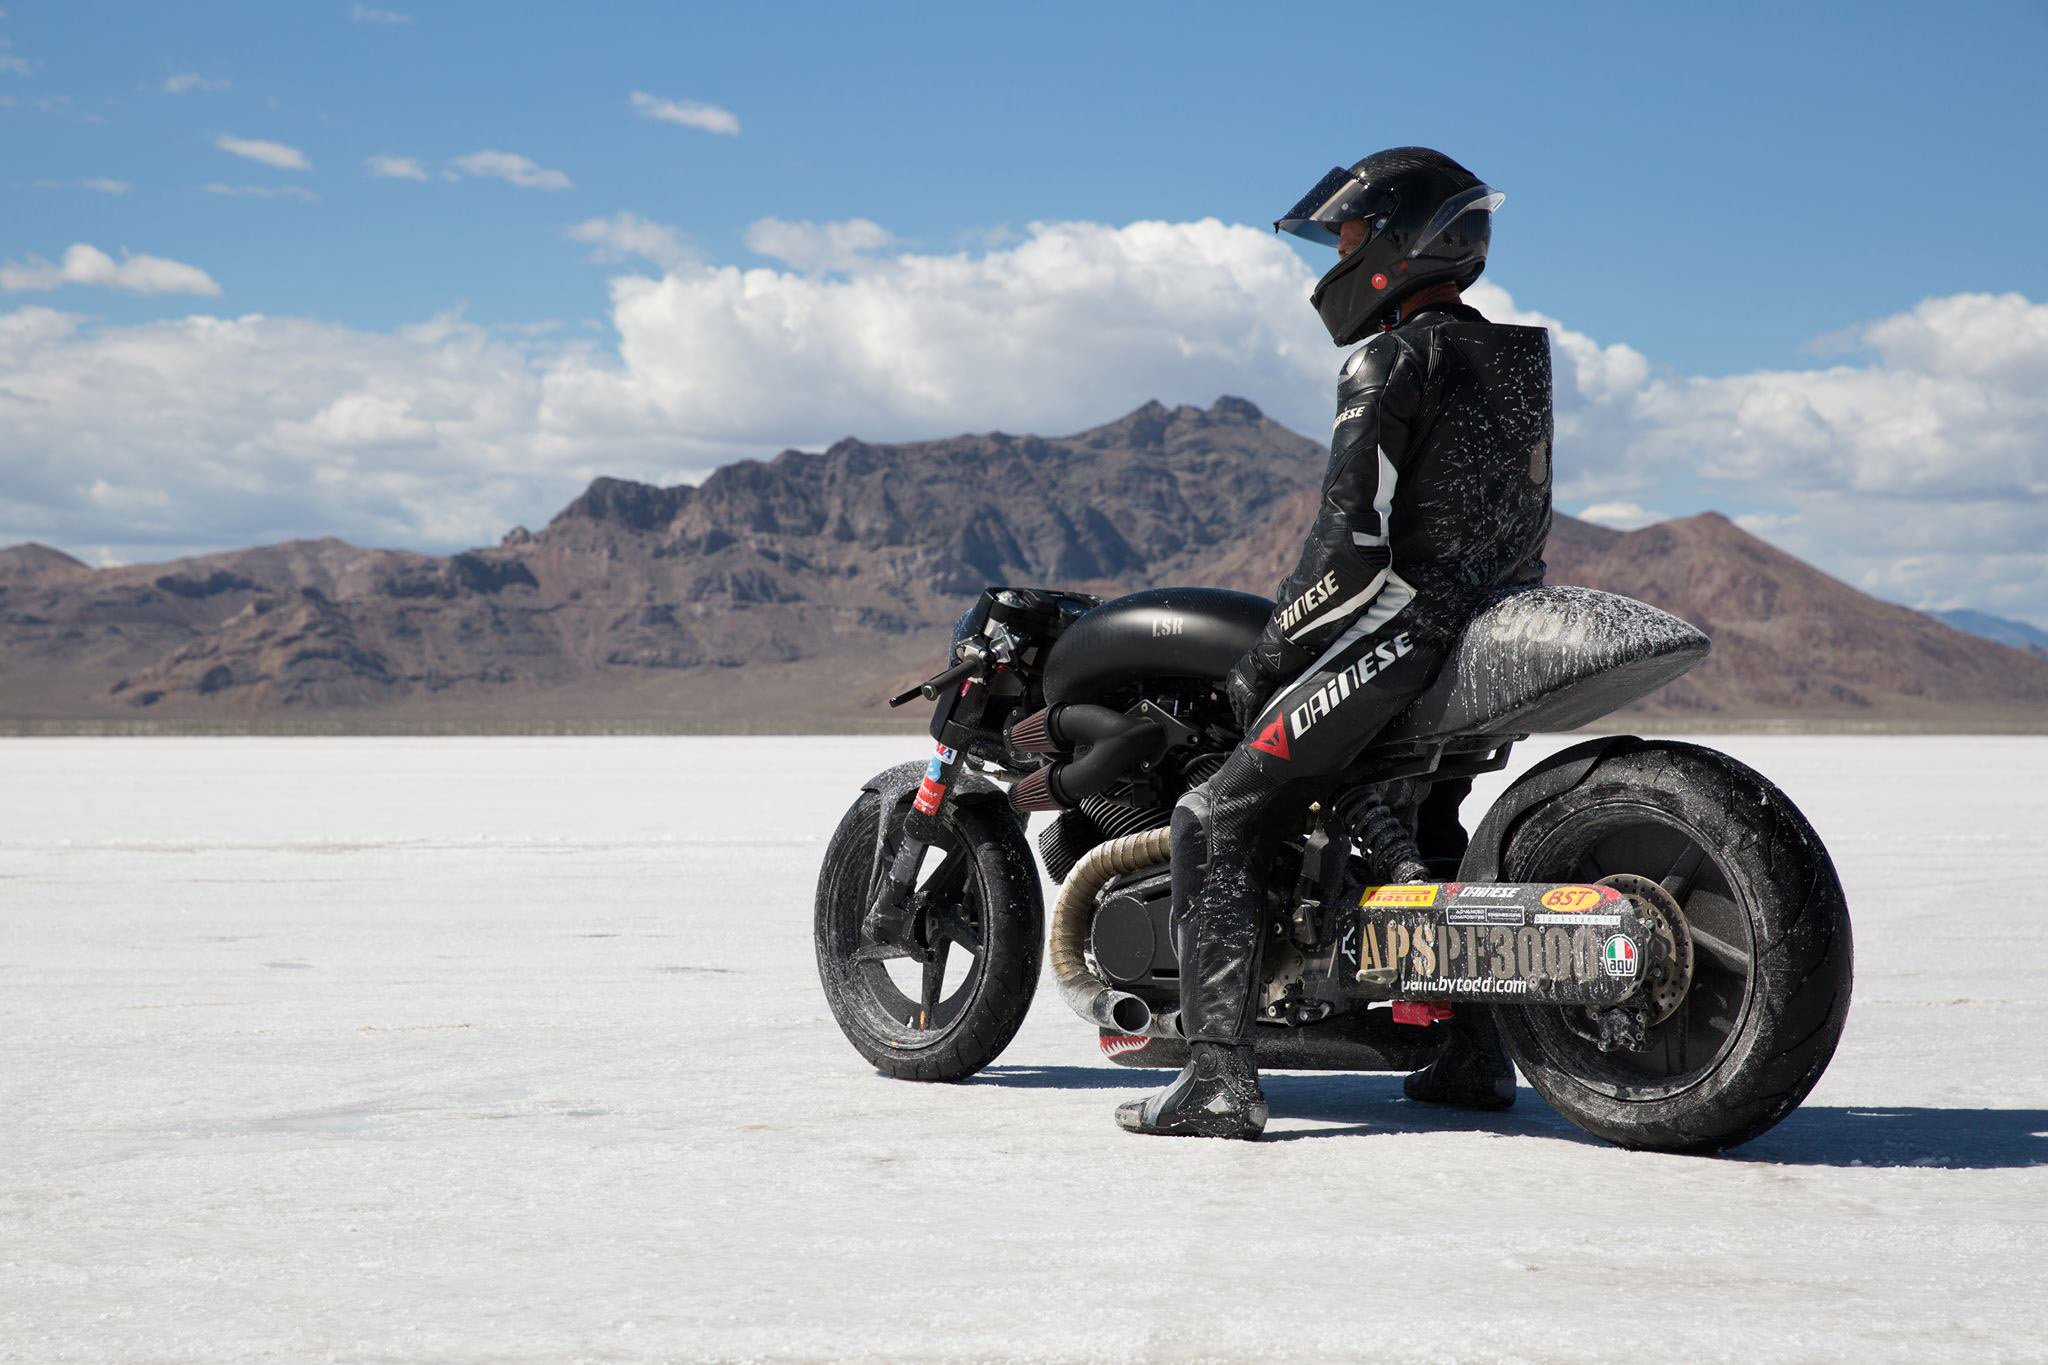 Superbike Girl Wallpaper Confederate Motorcycle Superbike Custom Bike Motorbike